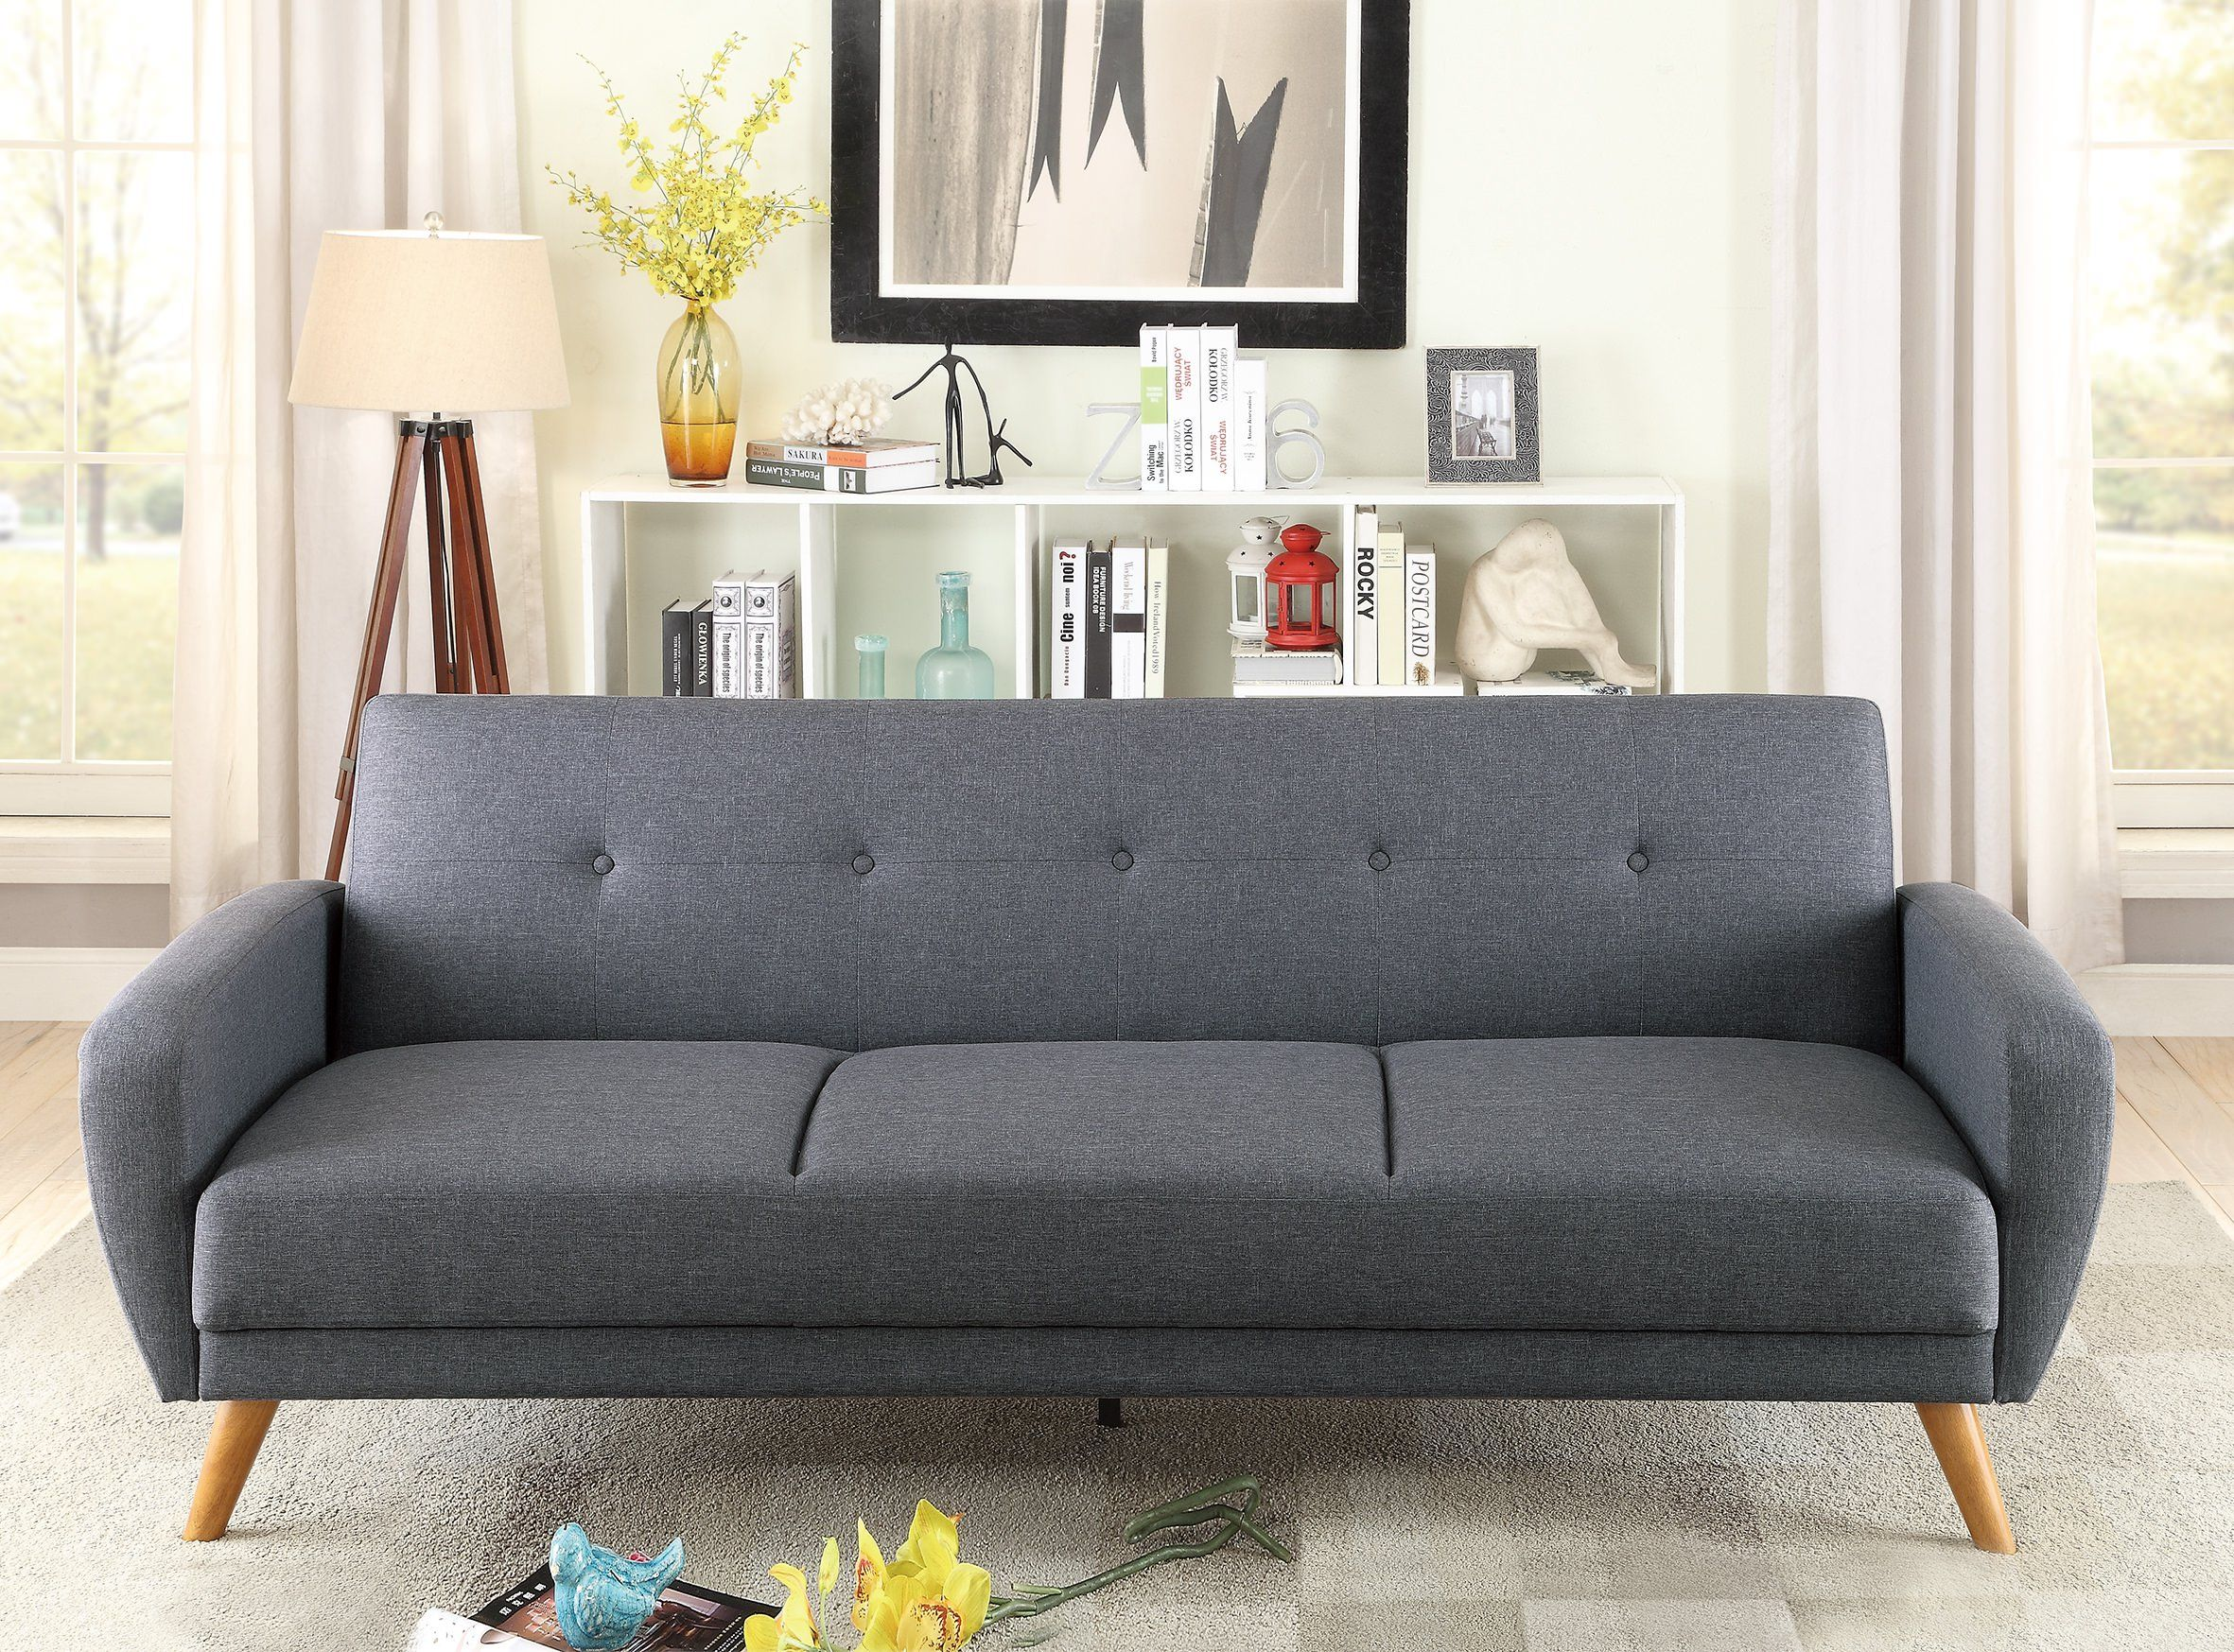 F6851 Blue Gray Convertible Sofa Bed By Poundex Futon Sofa